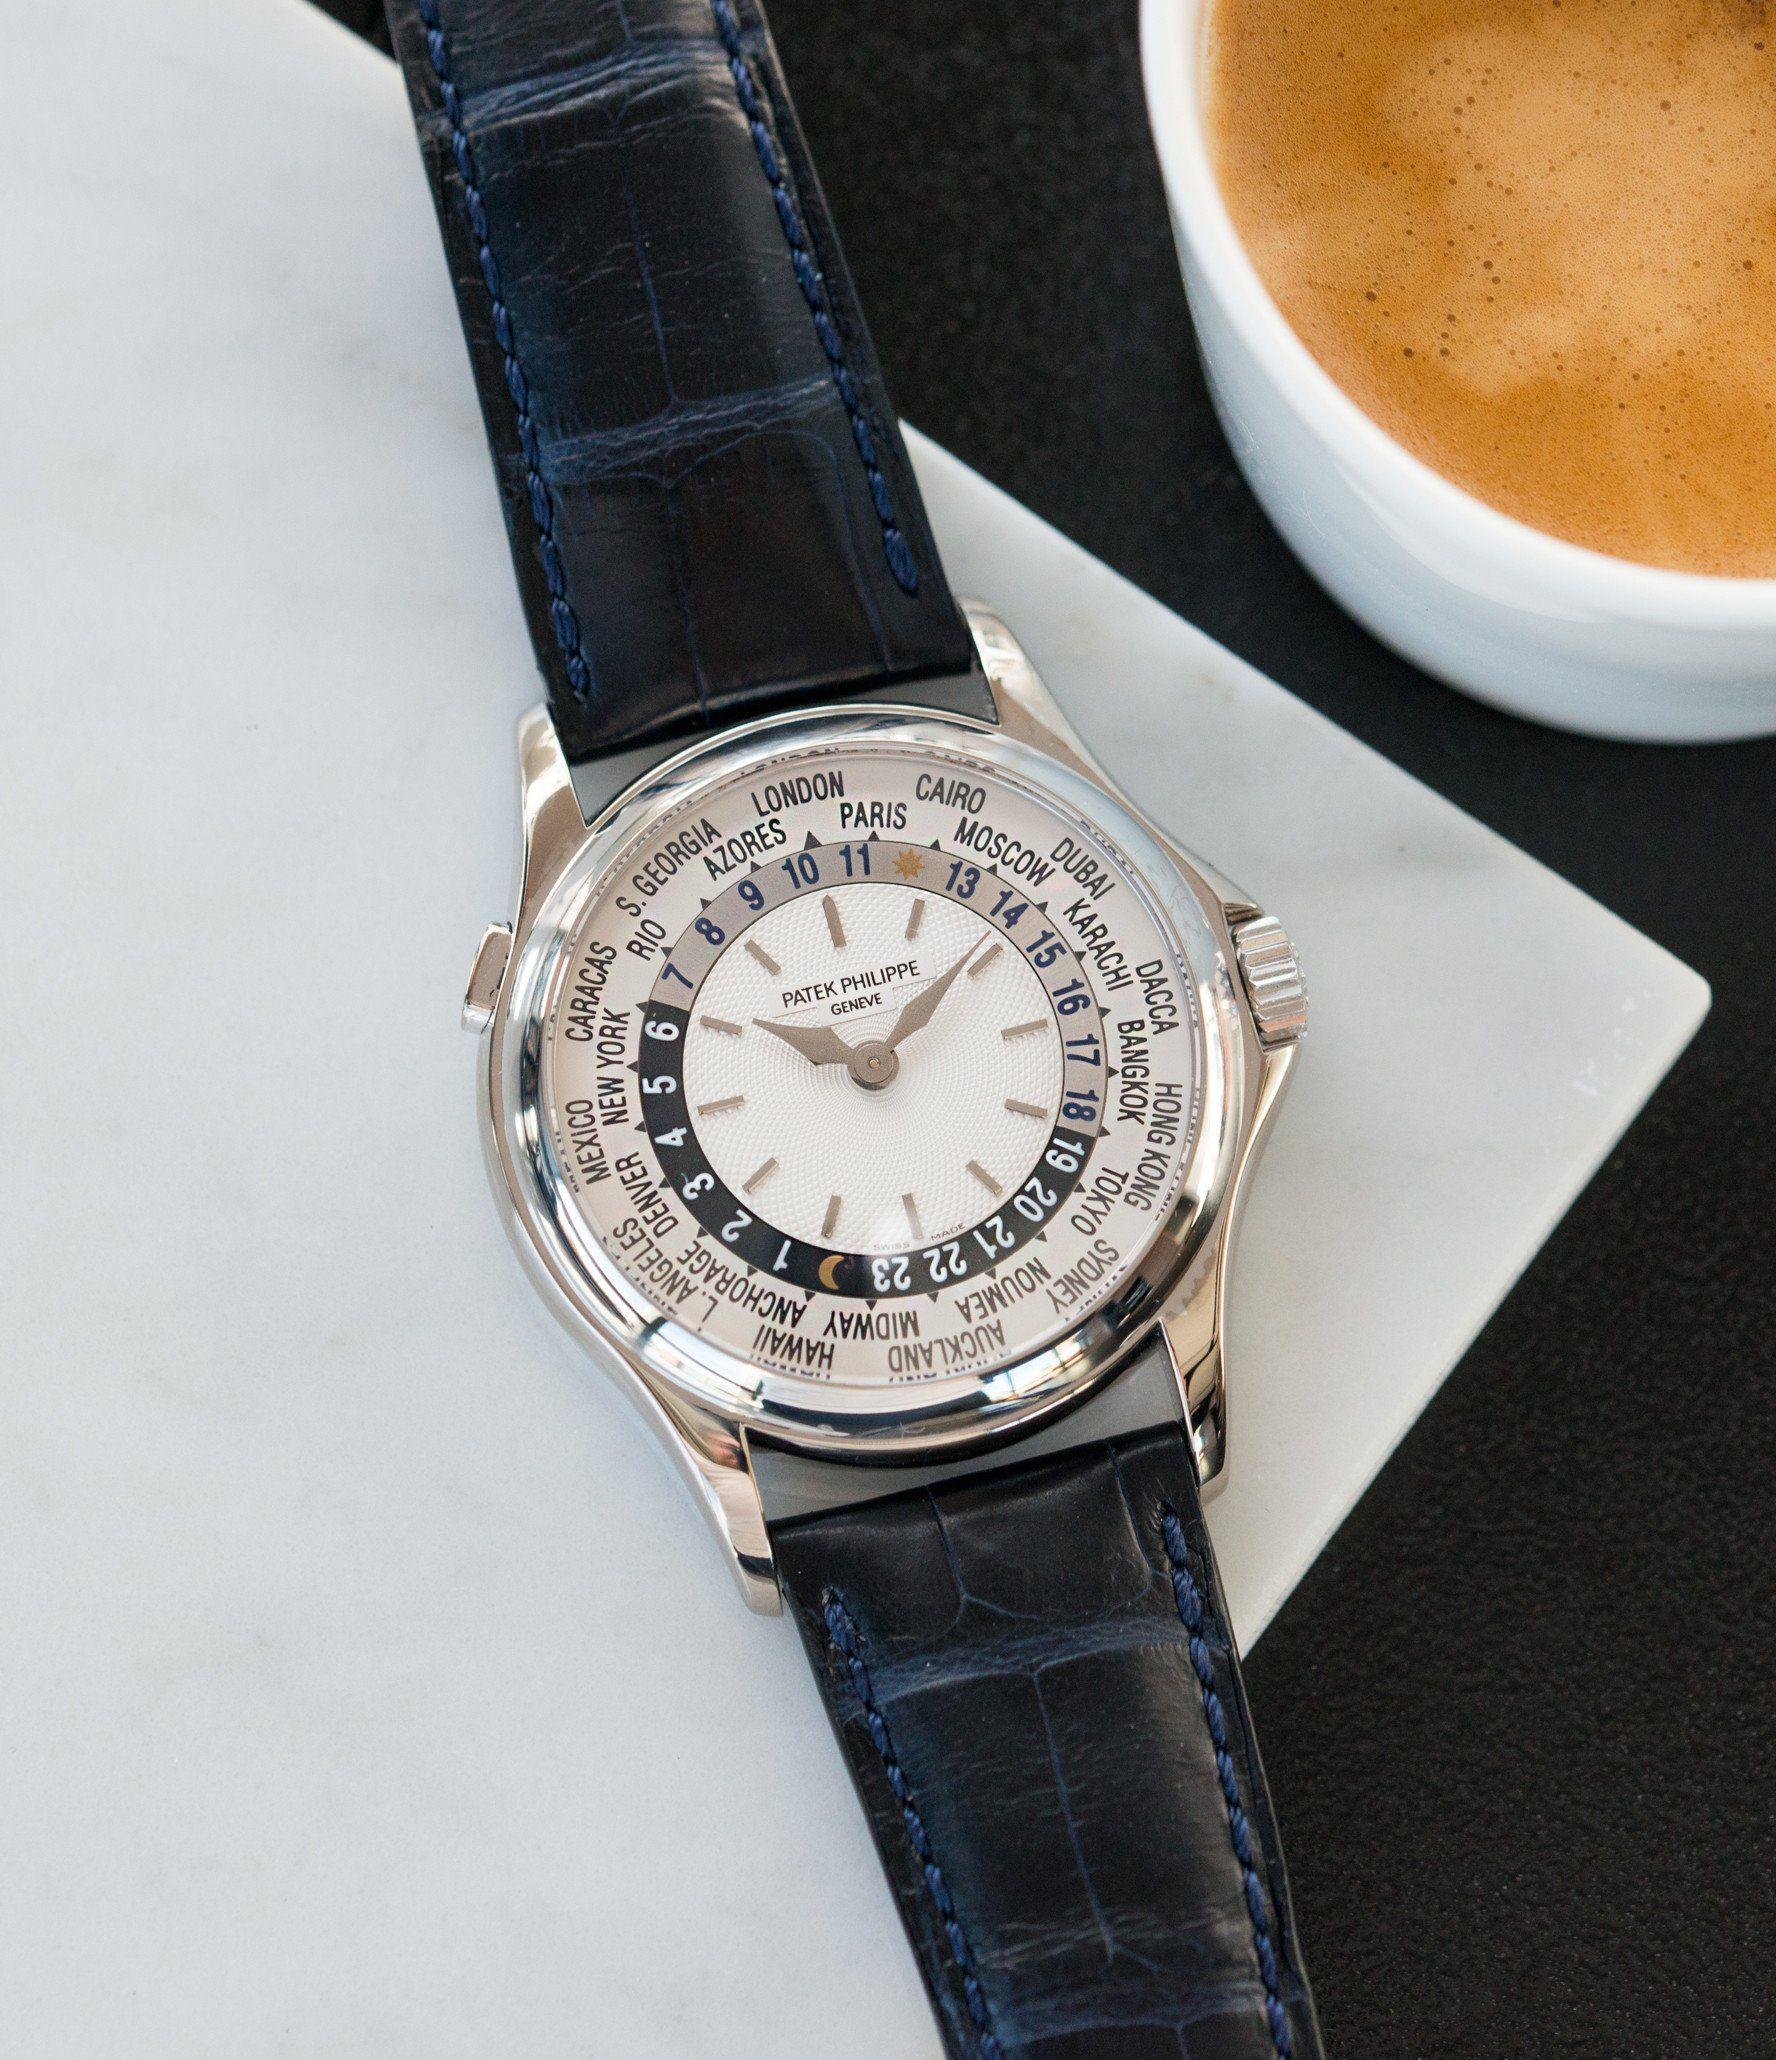 World Timer | 5110G-001 | white gold | Vintage watches